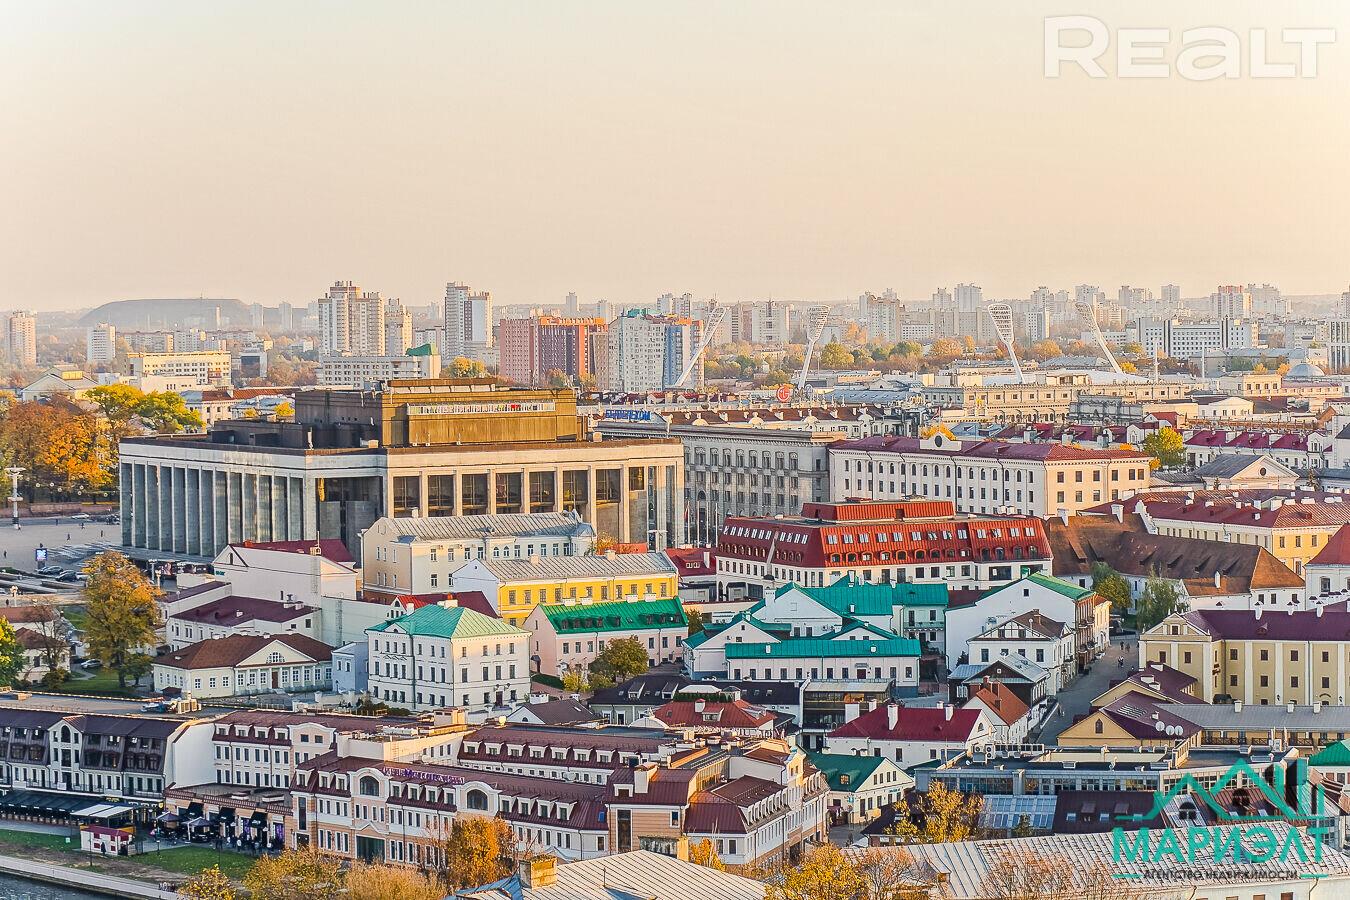 Продается 4-х комнатная квартира, ул. Сторожовская д.6 - фото №41